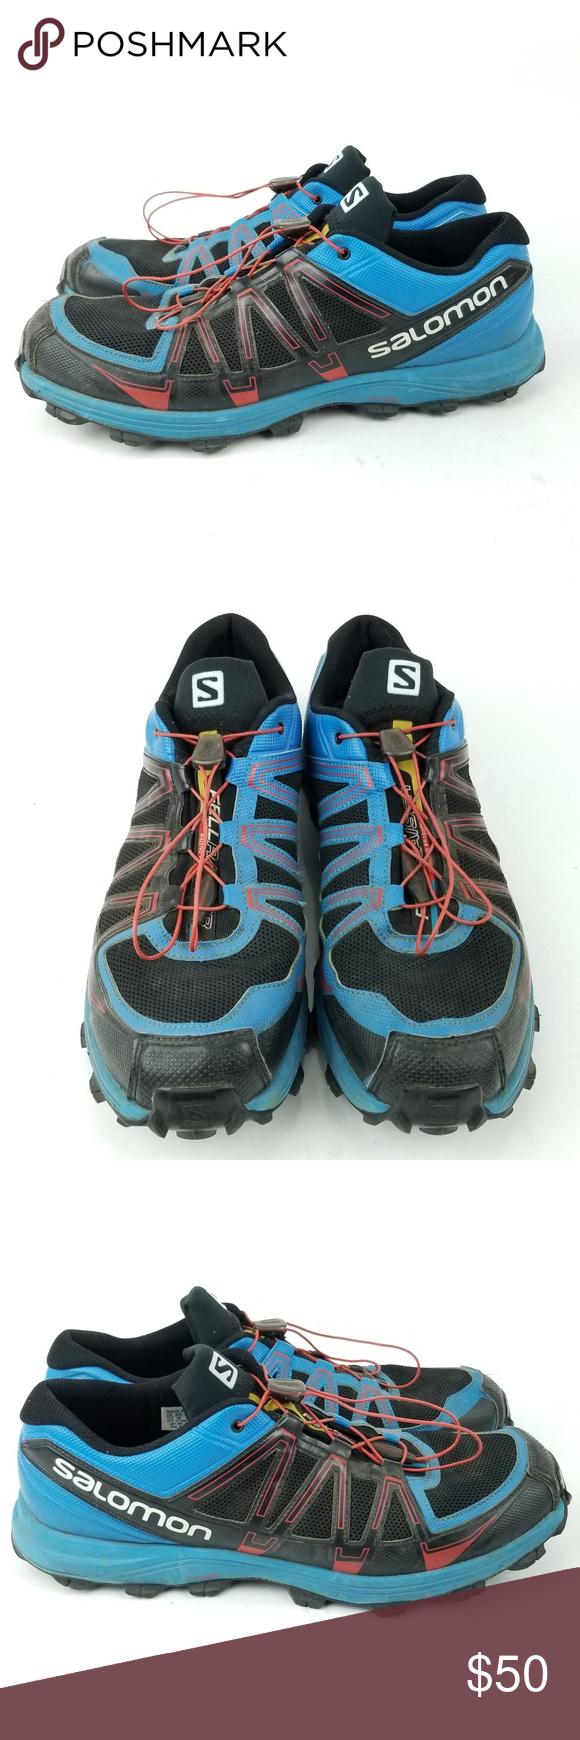 new arrival 9a43d 88240 Salomon Fellraiser Trail Running Shoes Sz 13 EH68 Mens Salomon Fellraiser  Black Blue Red Trail Running Shoes Sz 13 Very Good Used Condition, Light  Wear, ...